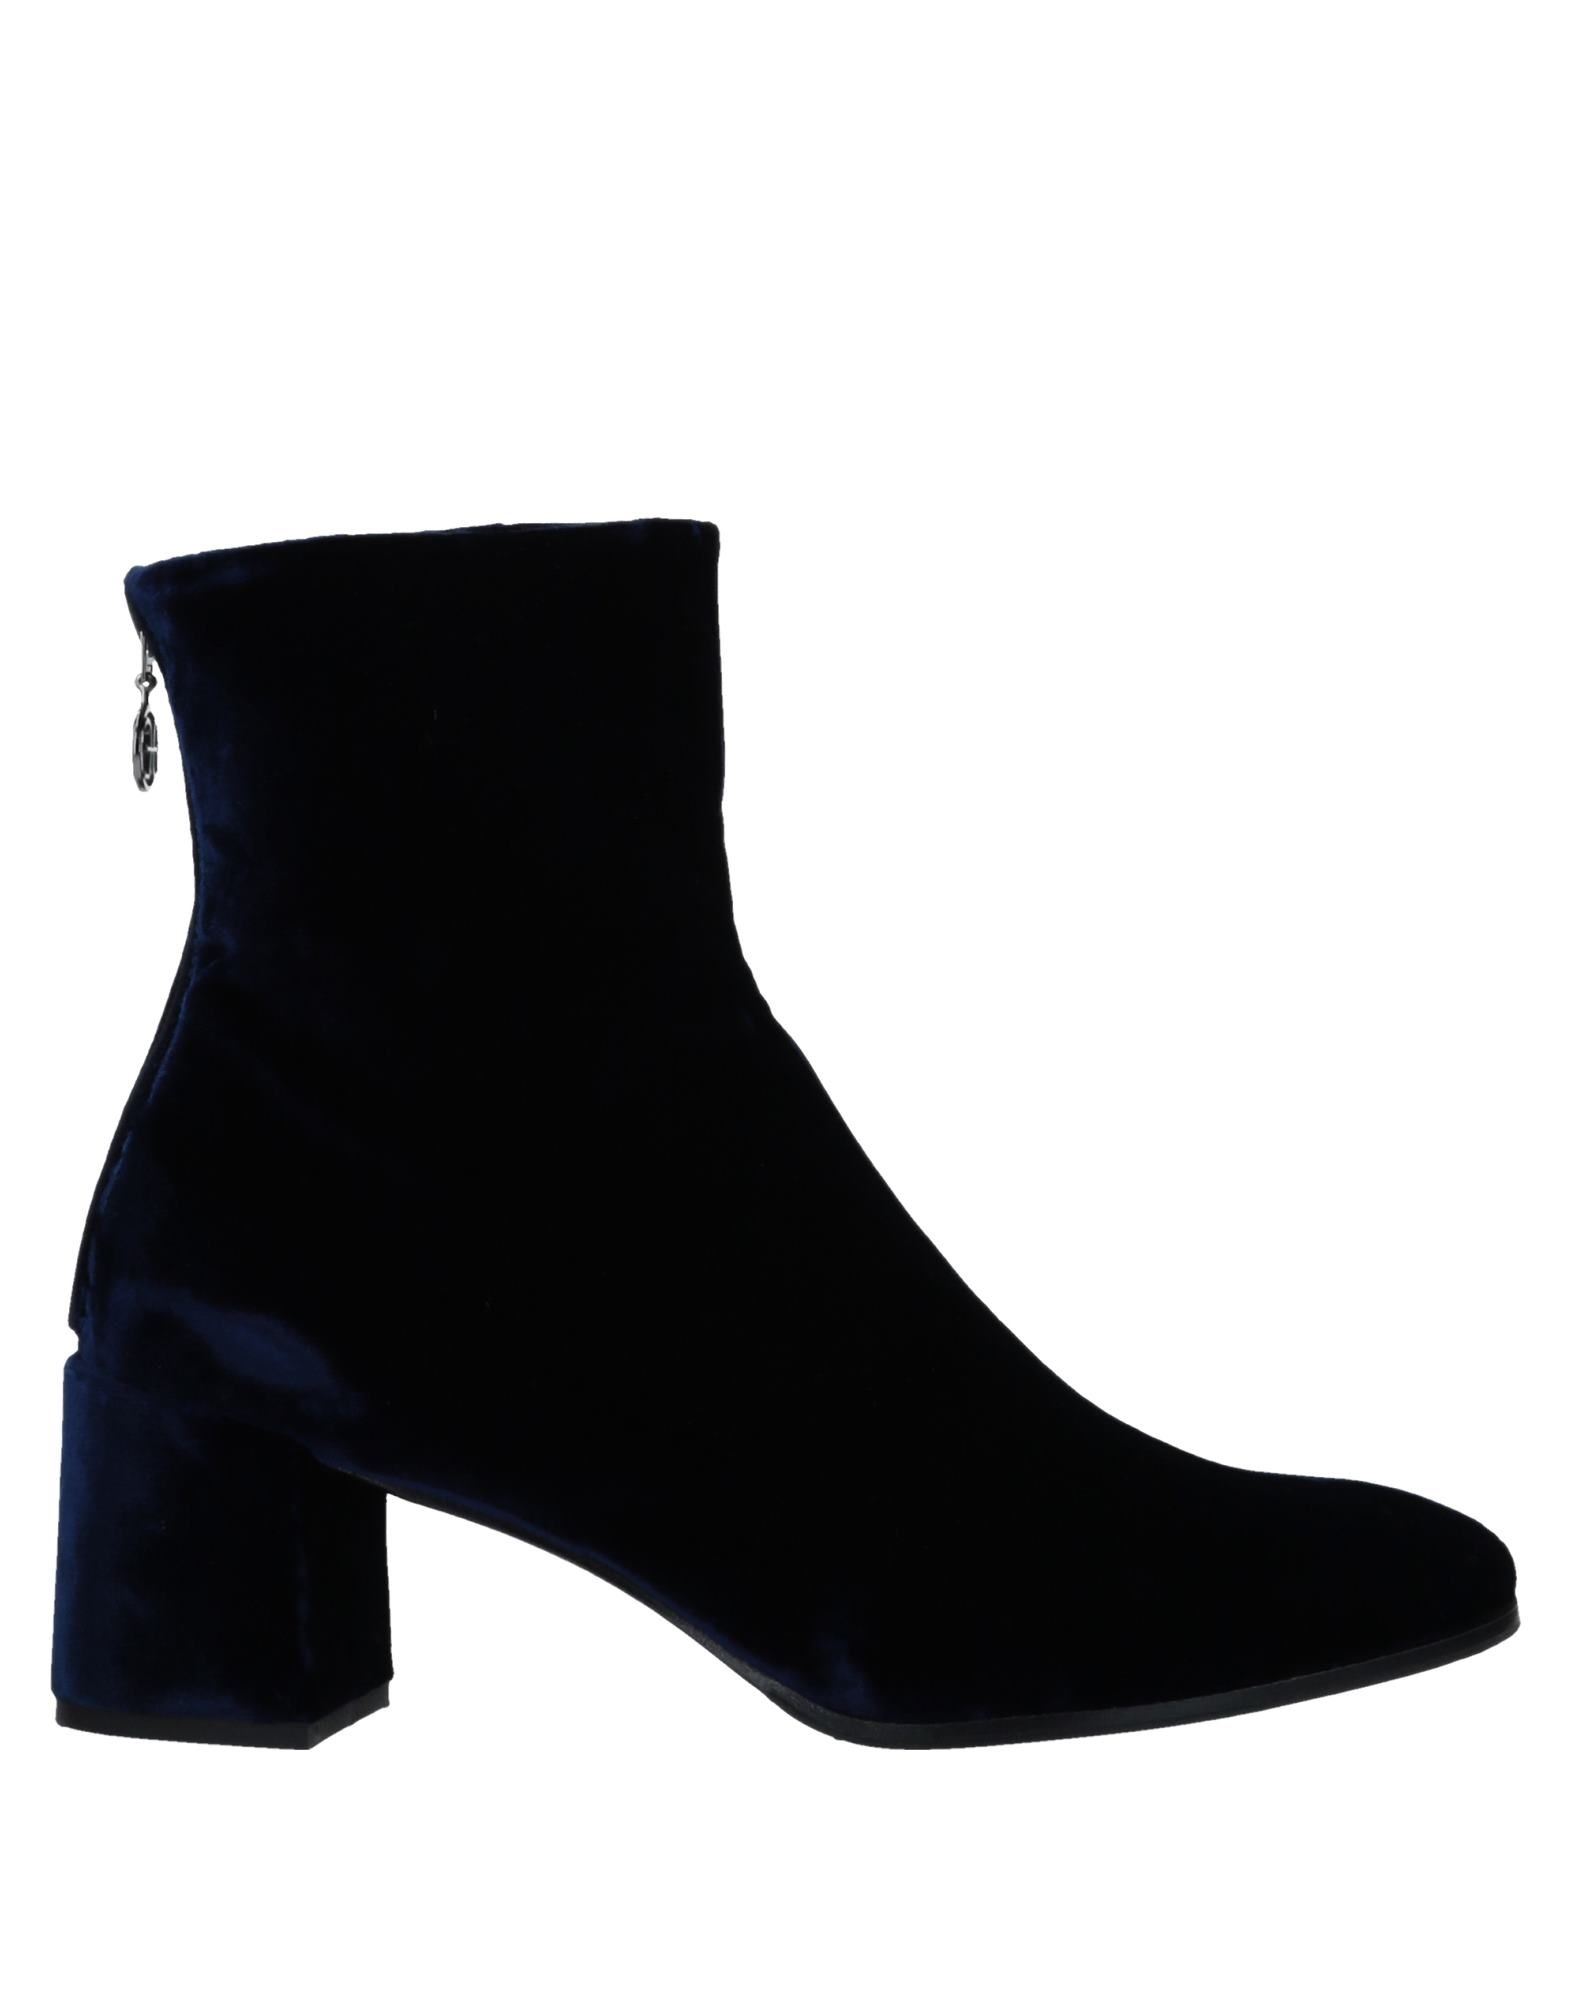 Rabatt Schuhe Fabi Stiefelette  Damen  Stiefelette 11531857RD 3b0f8a